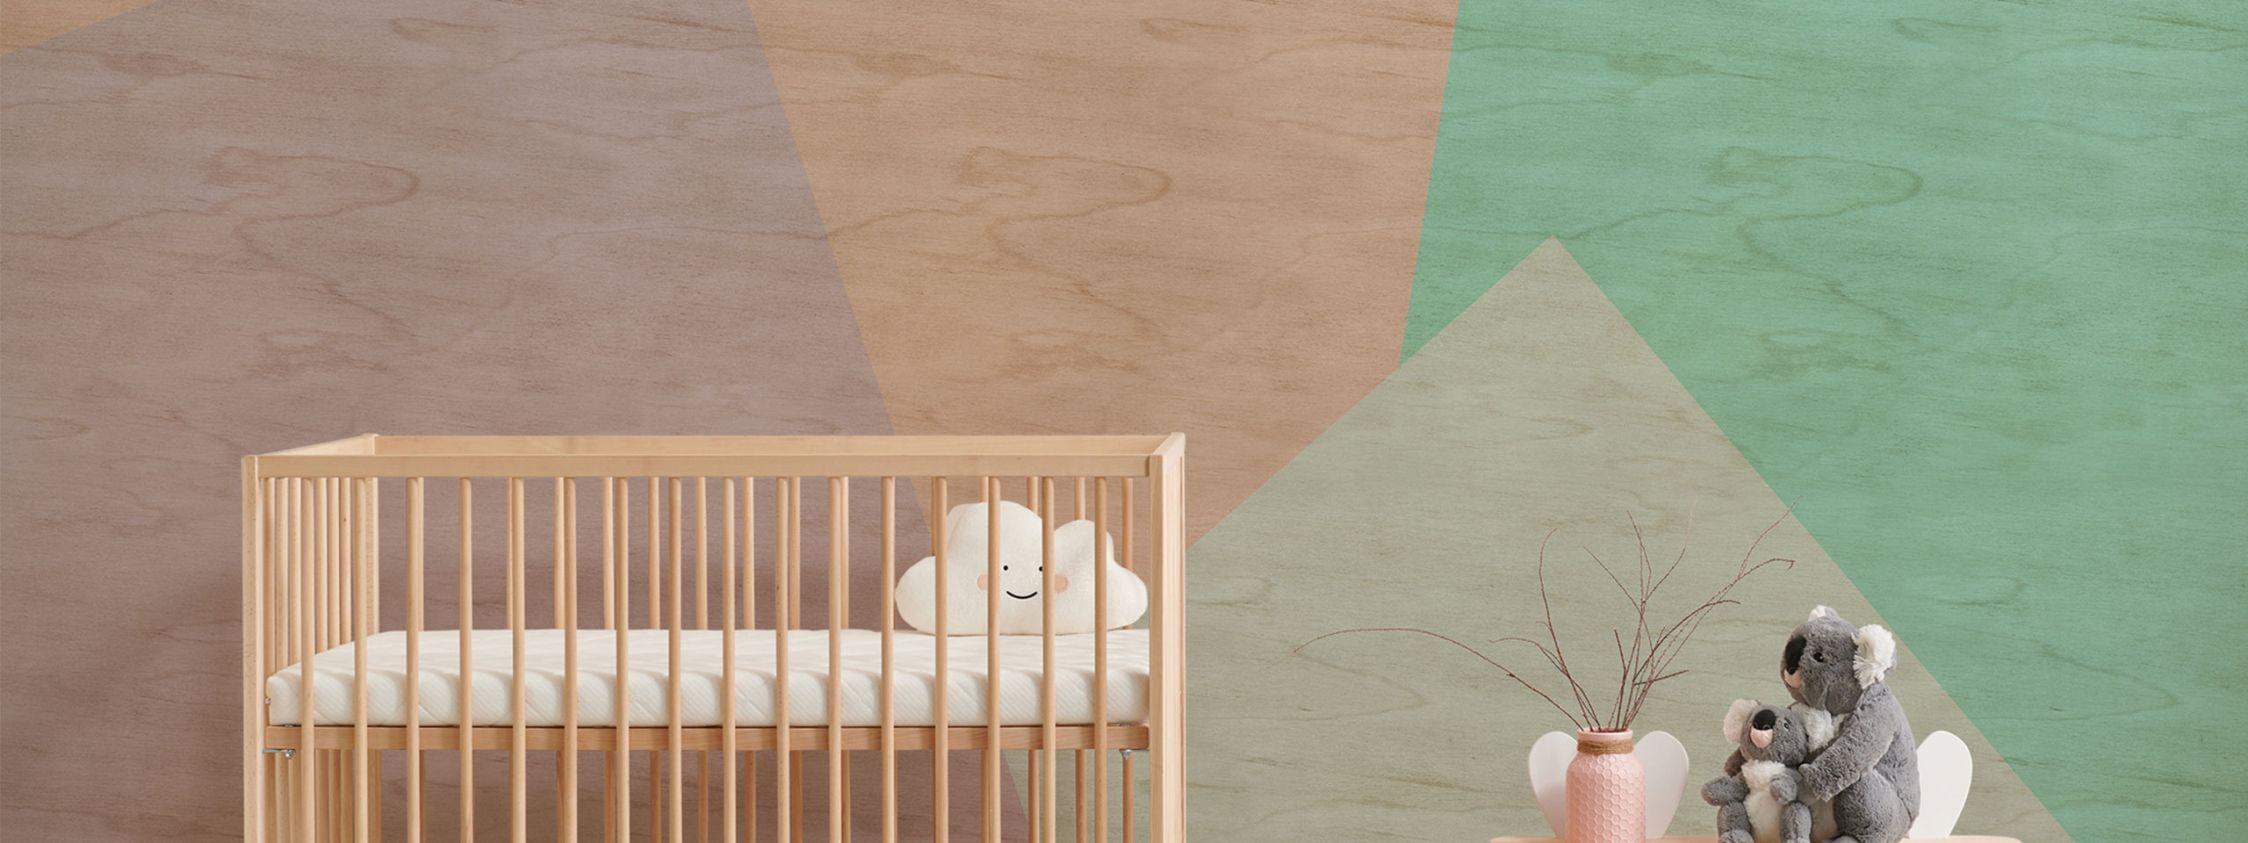 Kinderzimmer Tapete Berge